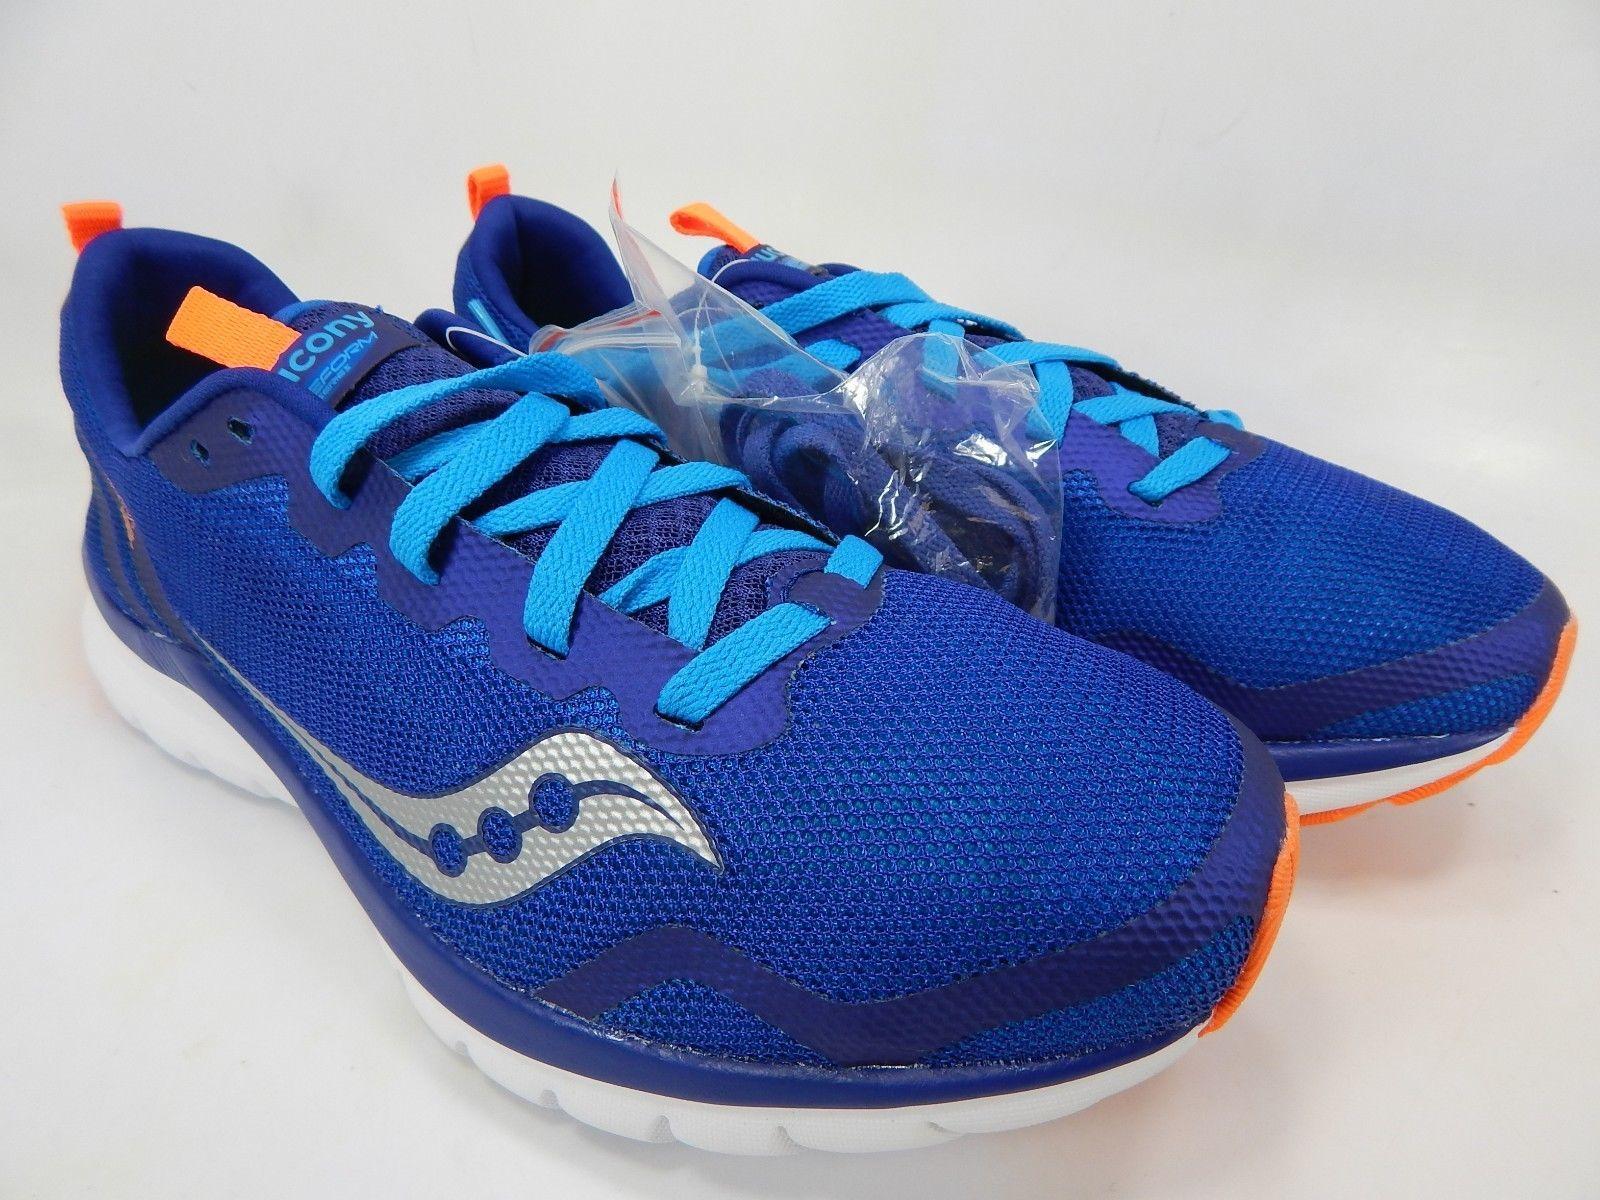 Saucony Liteform Feel Size 9 M (D) EU 42.5 Men's Running Shoes Blue S40008-1